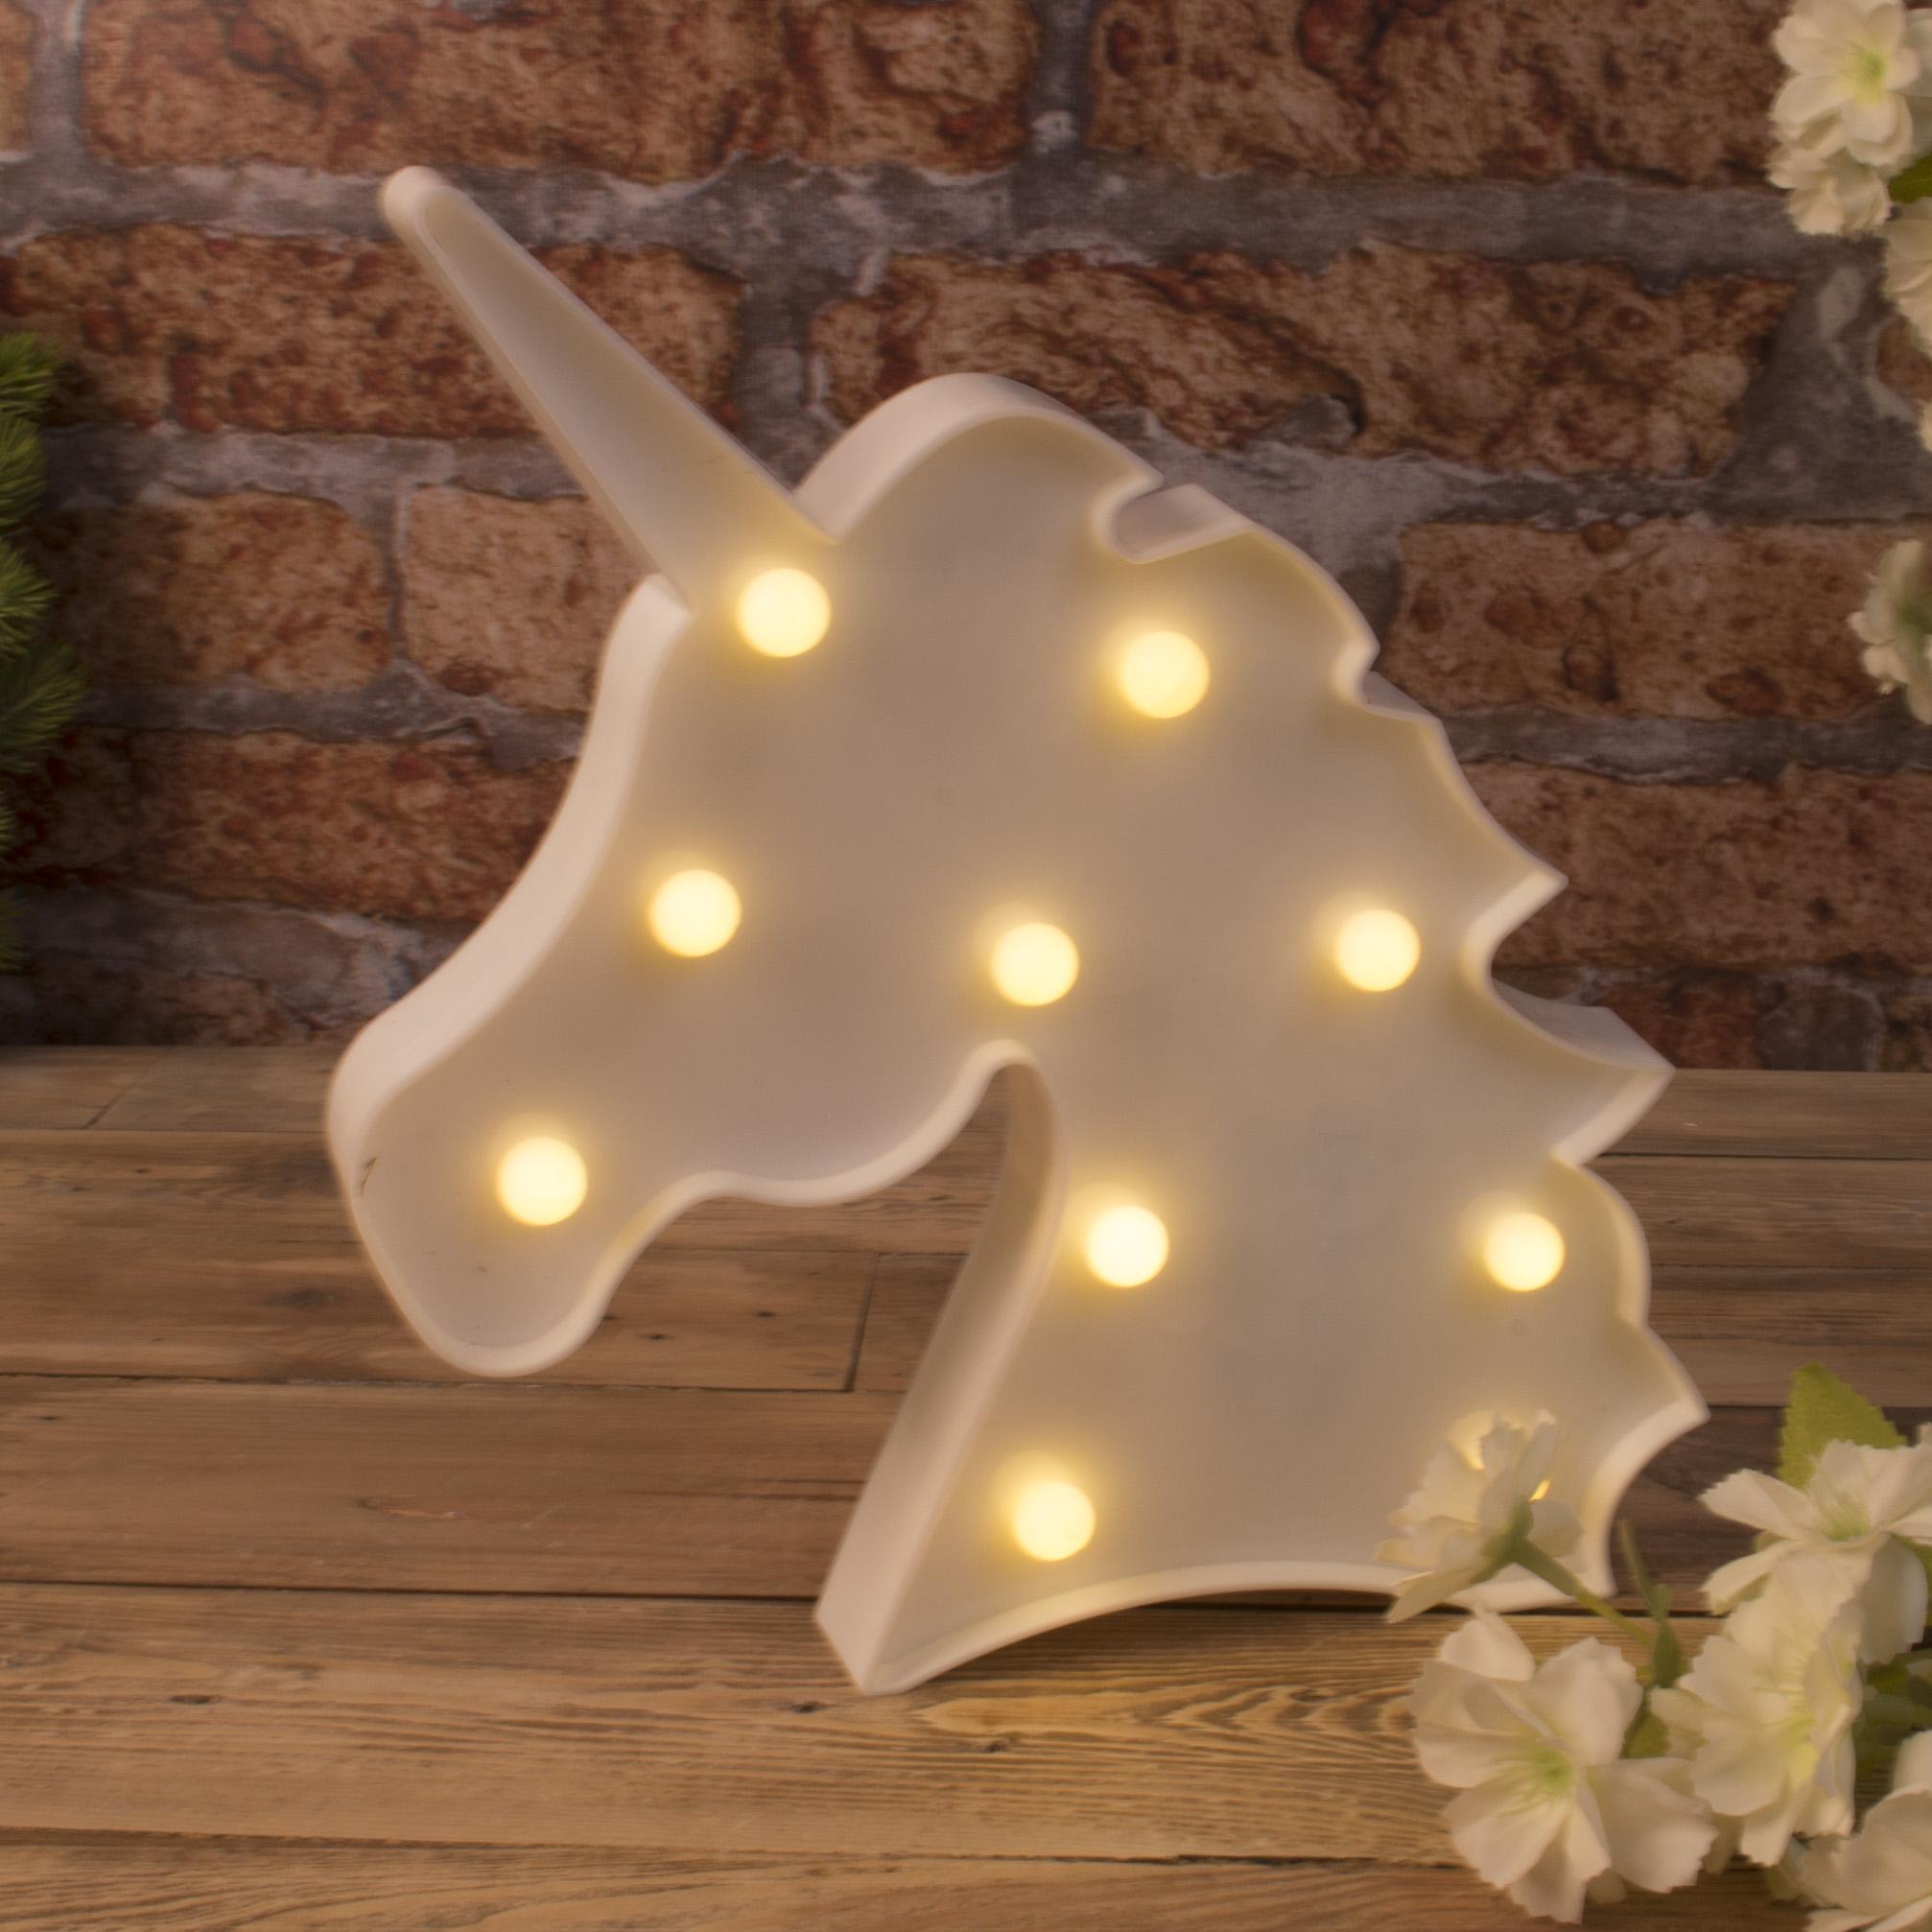 Статуэтка LED единорог